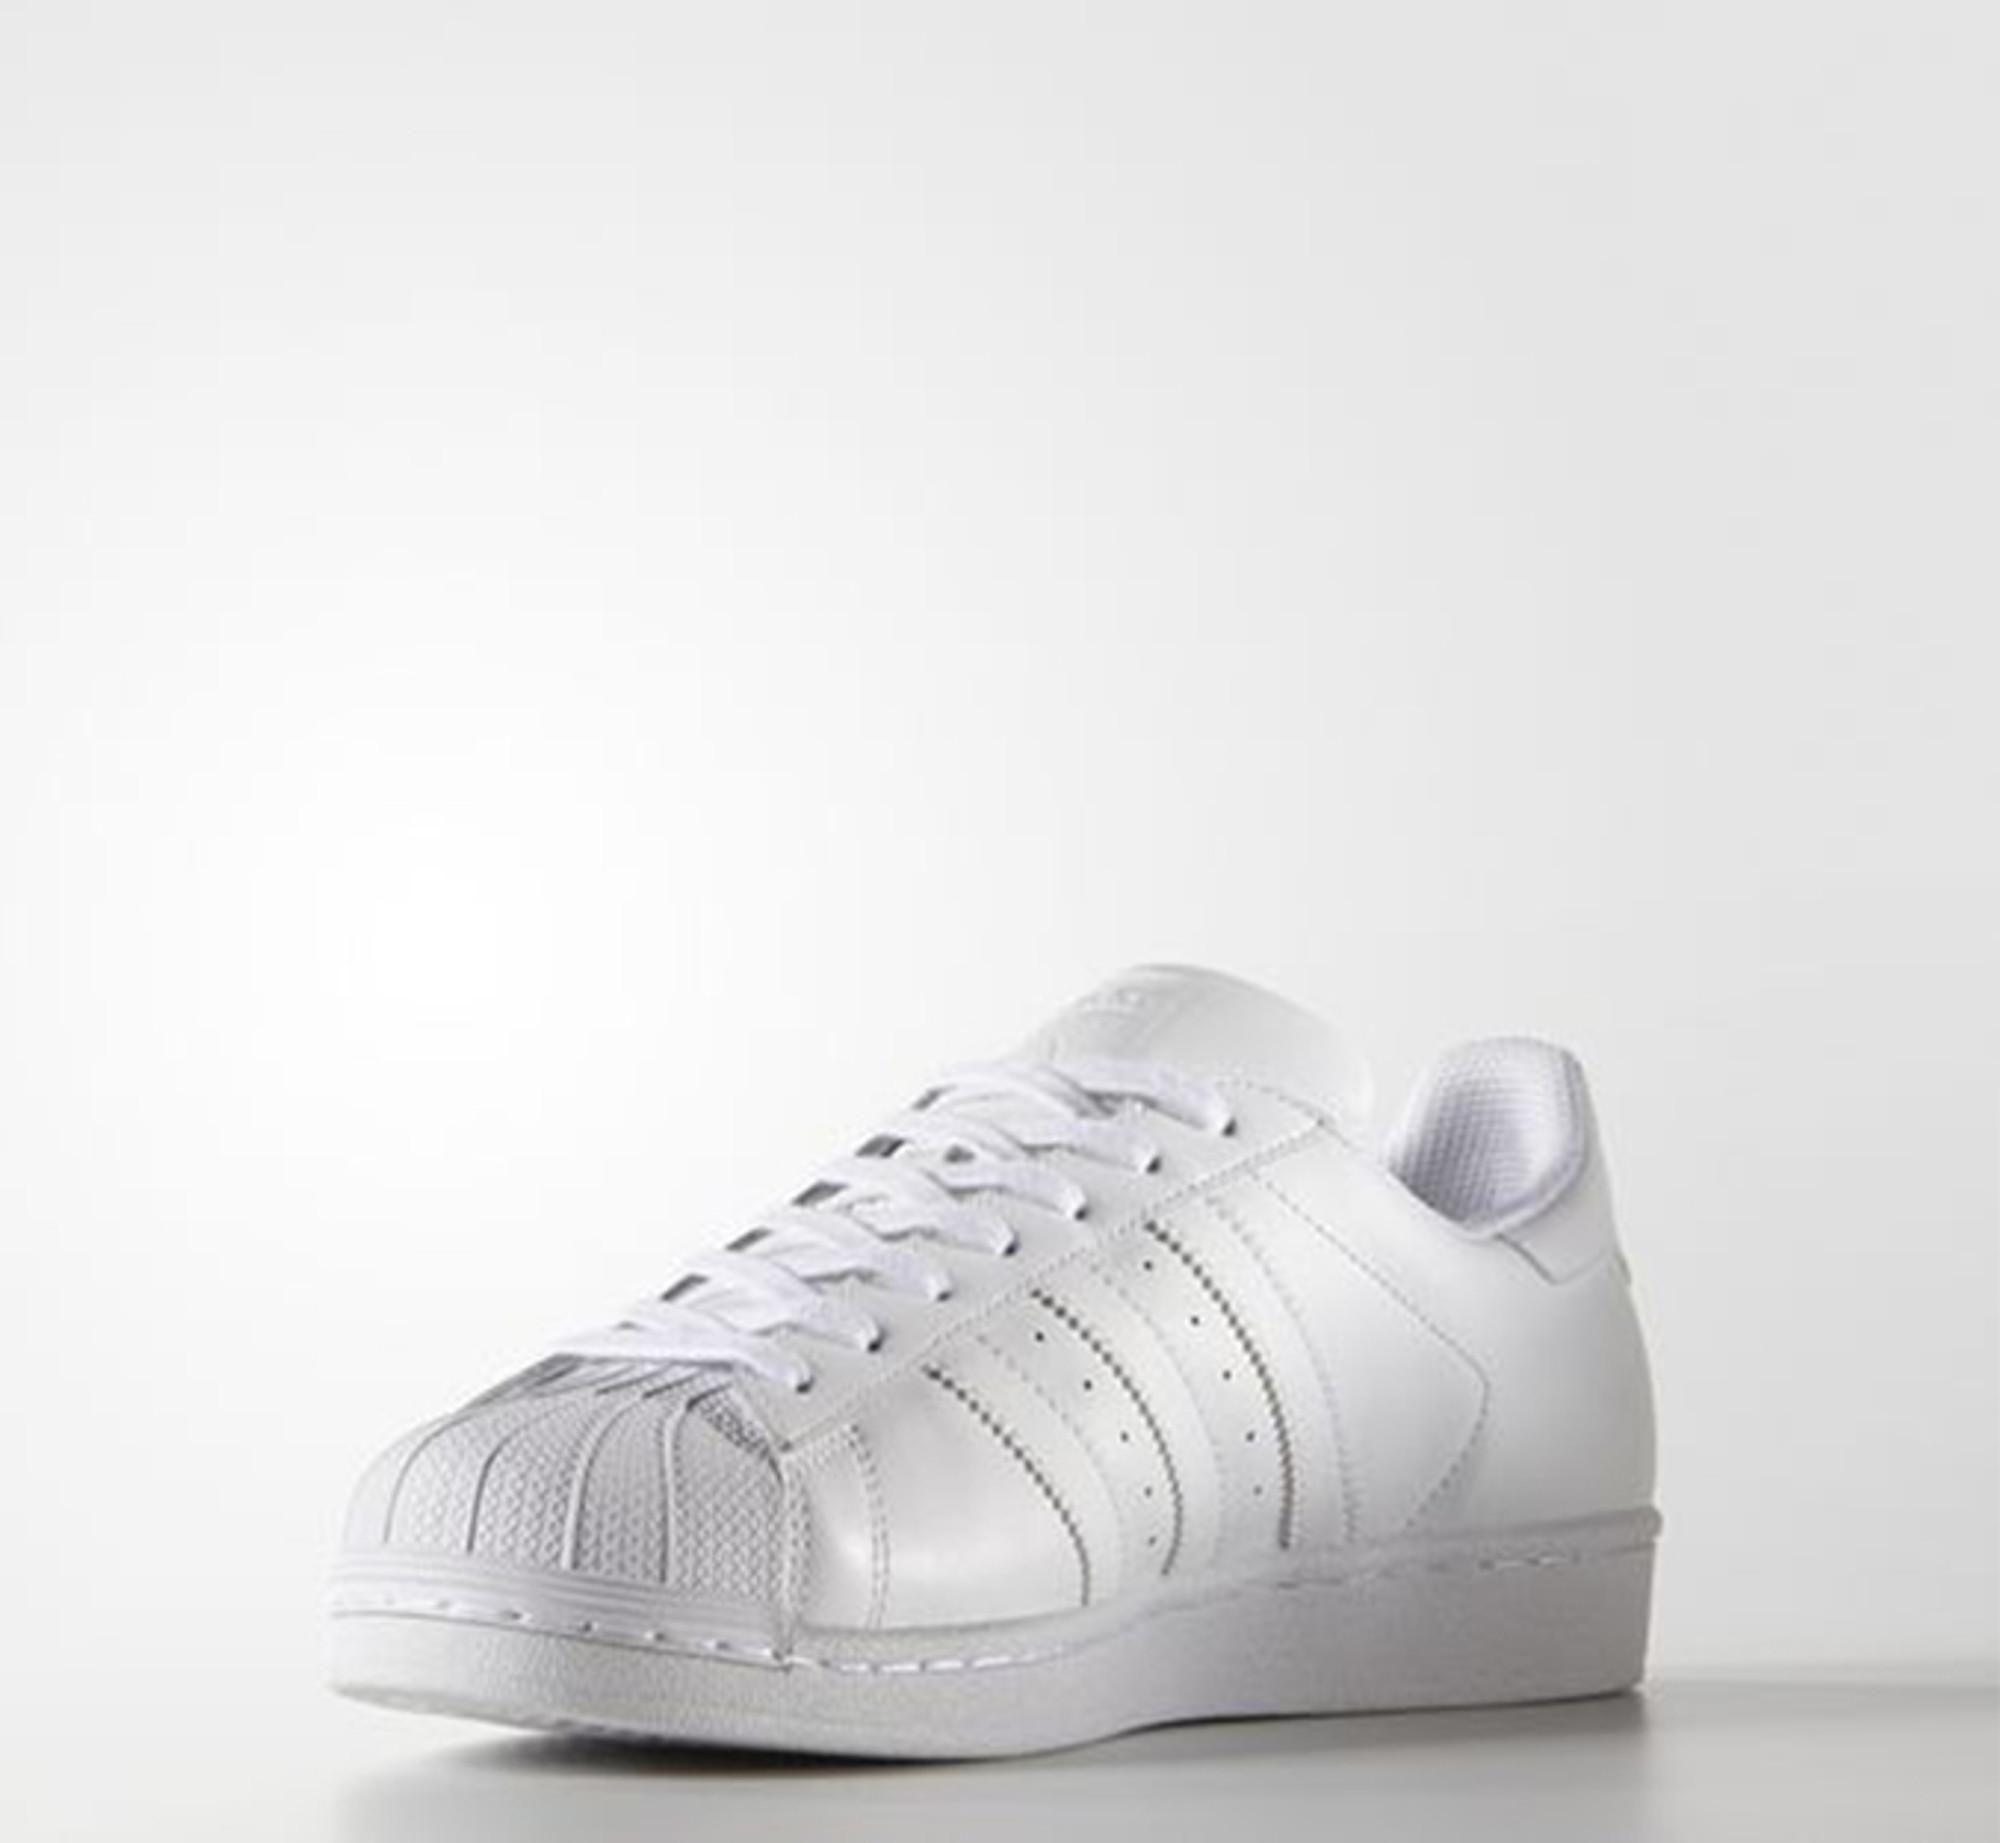 sports shoes 9a34b a7598 adidas SuperStar Foundation